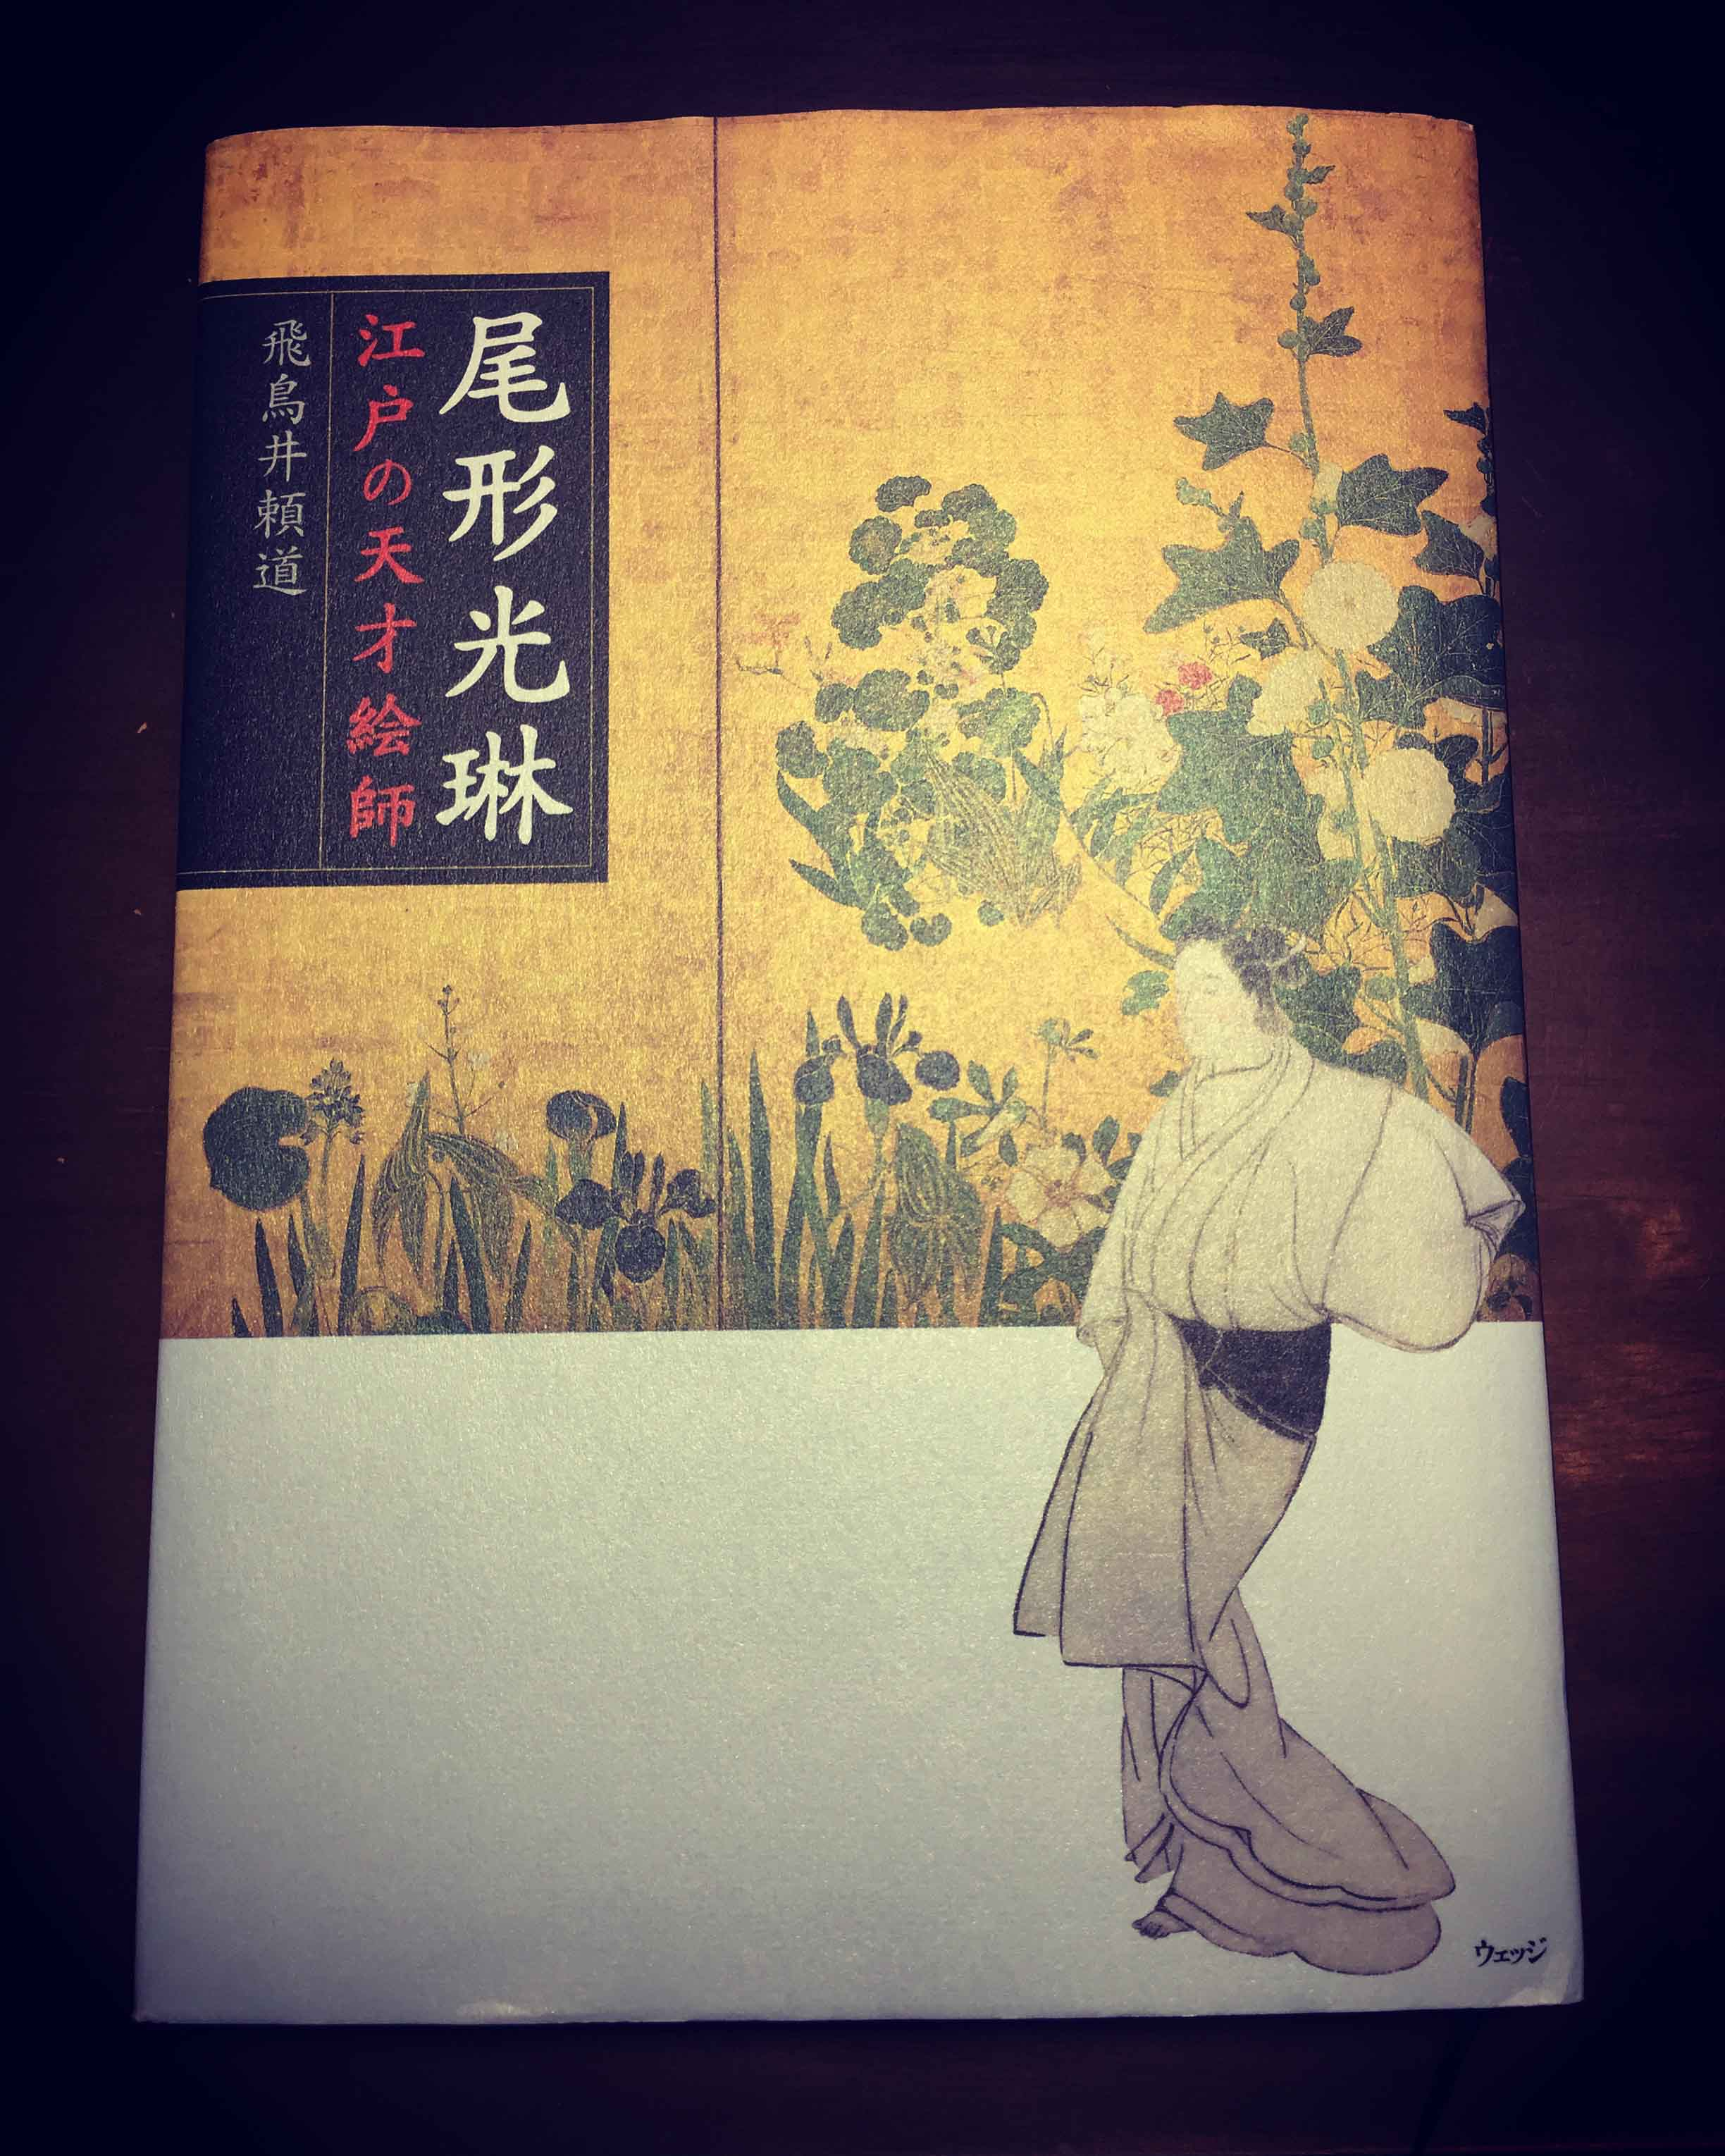 『尾形光琳 江戸の天才絵師』